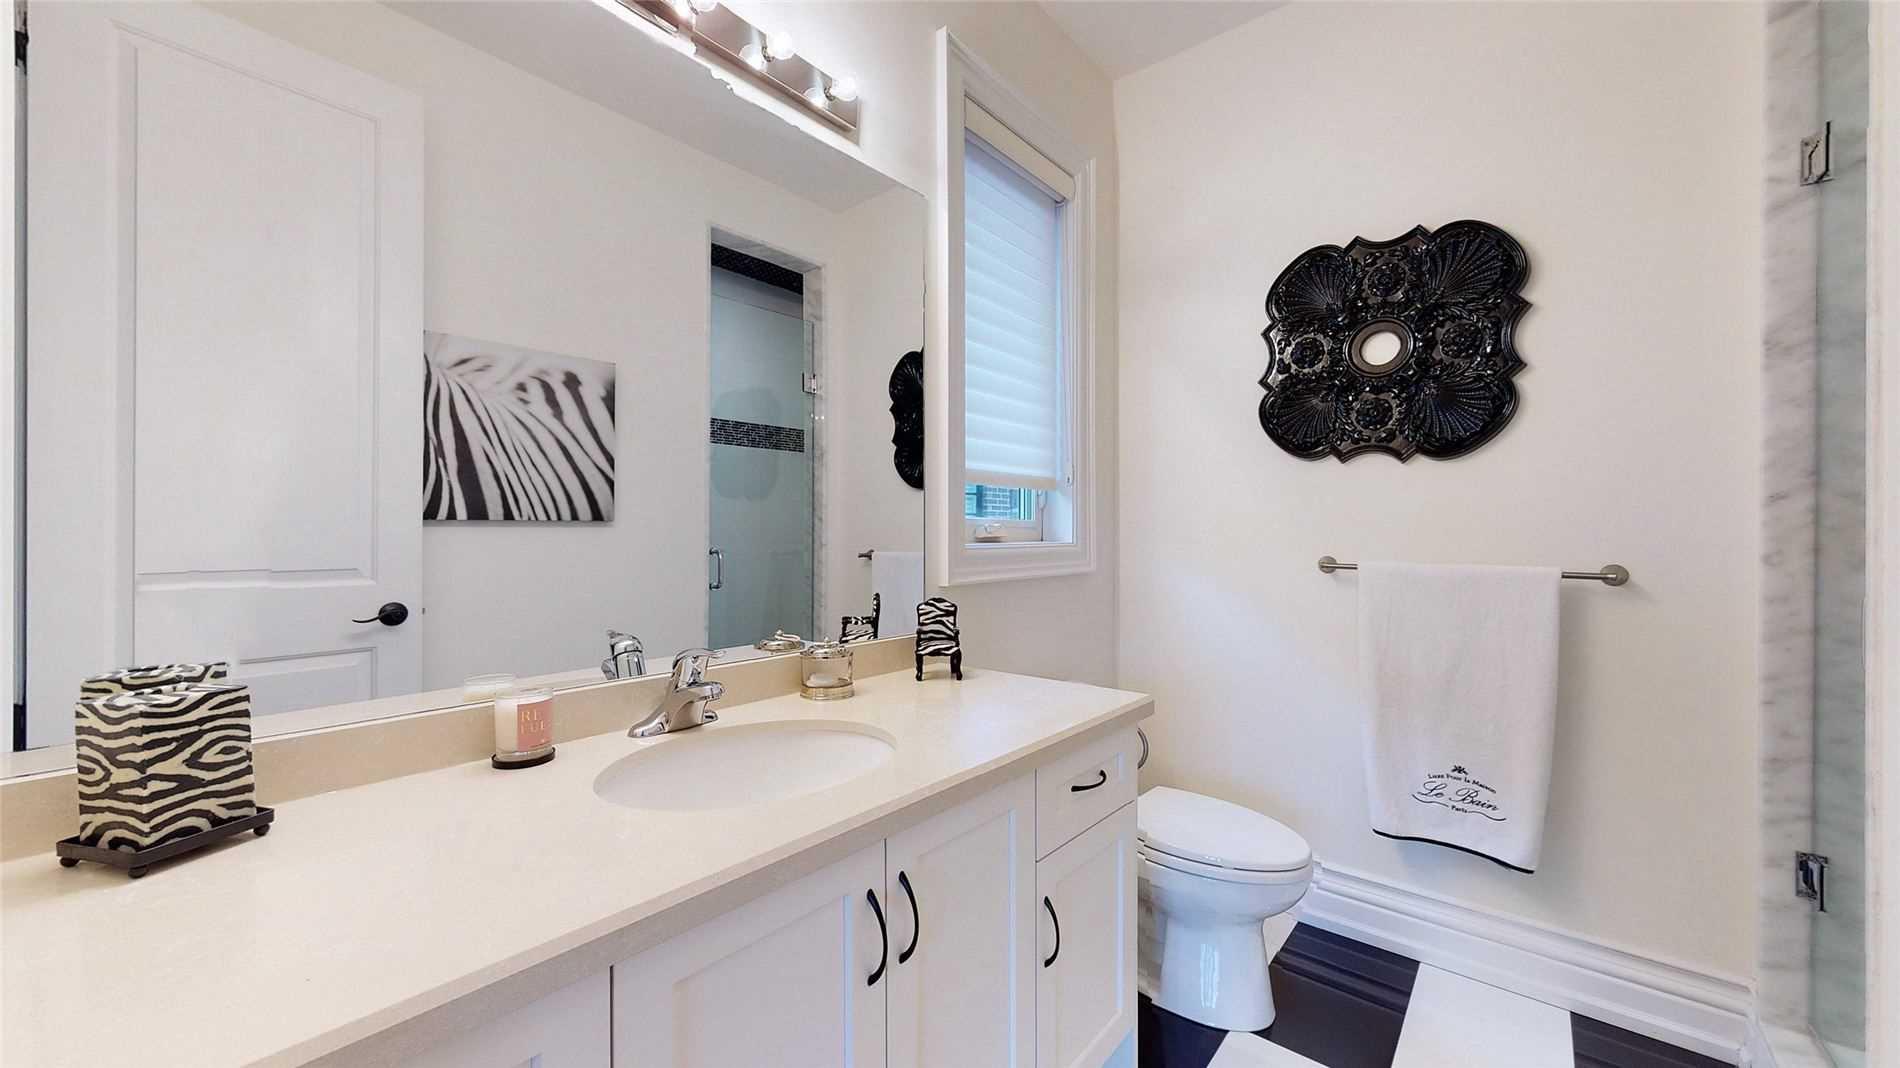 46A Puccini Dr, Richmond Hill, Ontario L4E2Y6, 5 Bedrooms Bedrooms, 14 Rooms Rooms,7 BathroomsBathrooms,Detached,For Sale,Puccini,N5304663